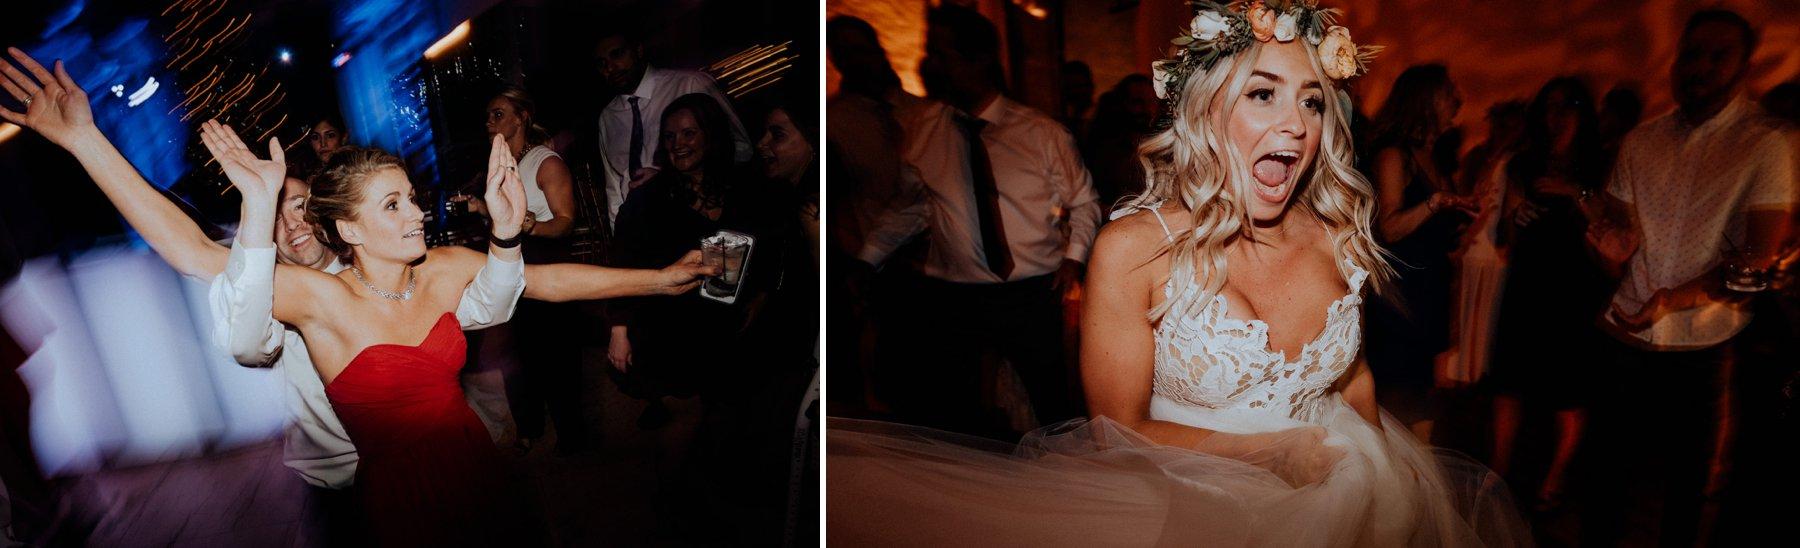 296-303-penn-oaks-wedding-5.jpg